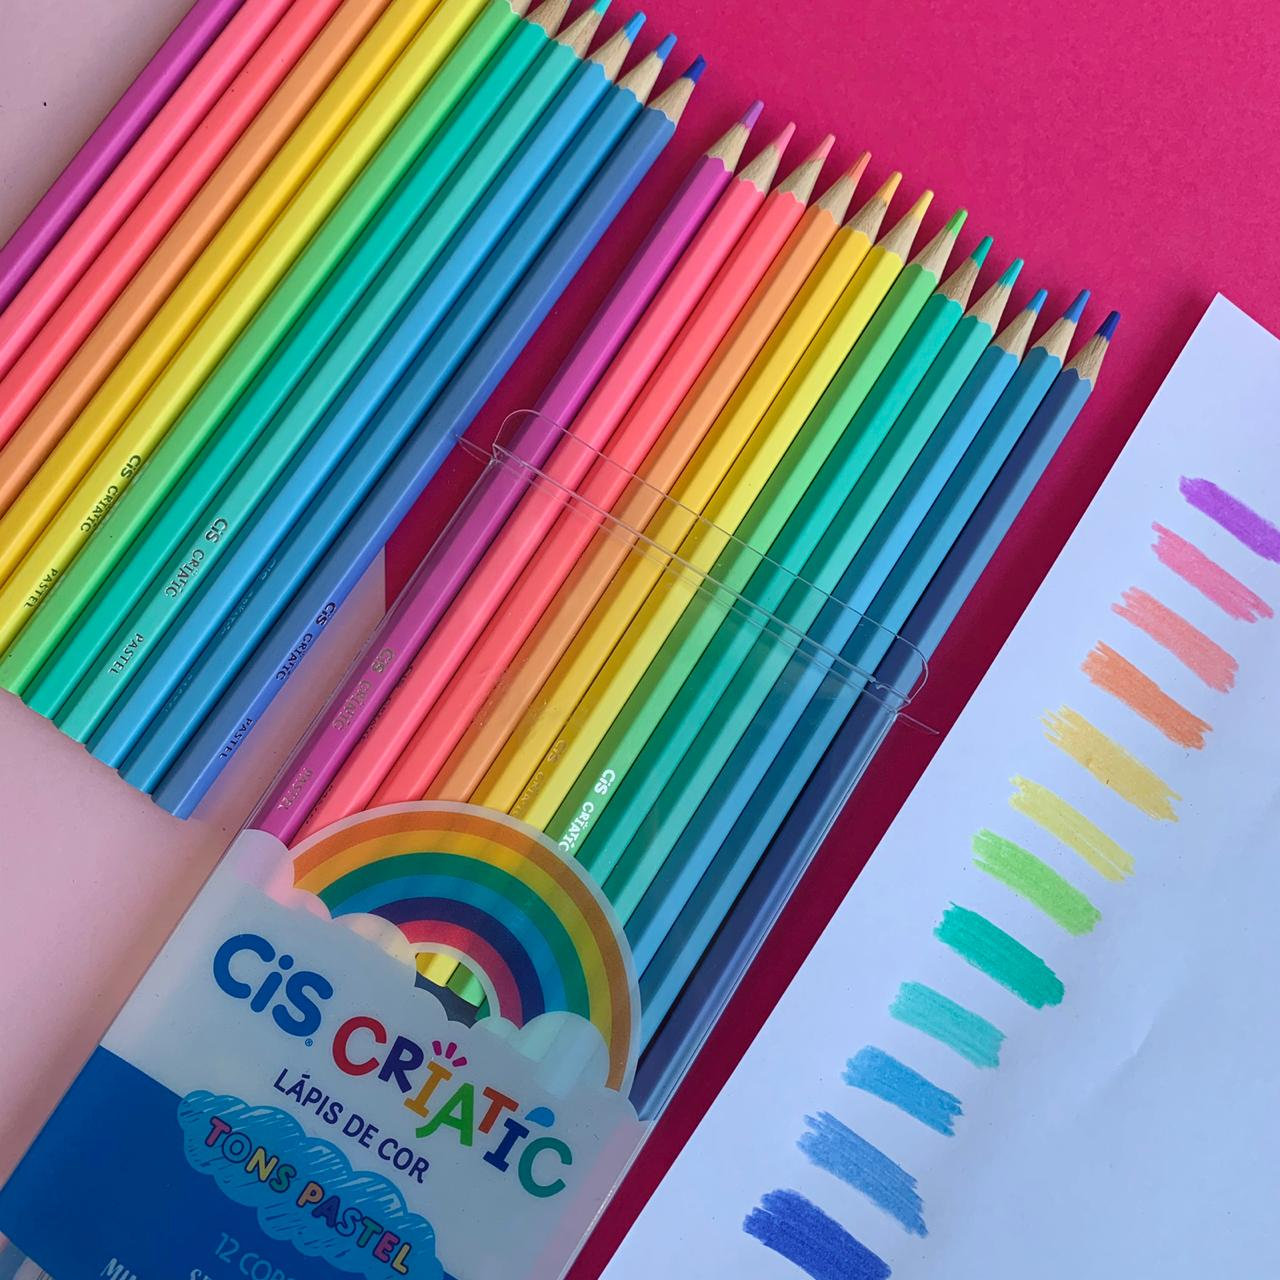 Criatic Tons Pastel Lápis de cor 12 Unidades | CiS